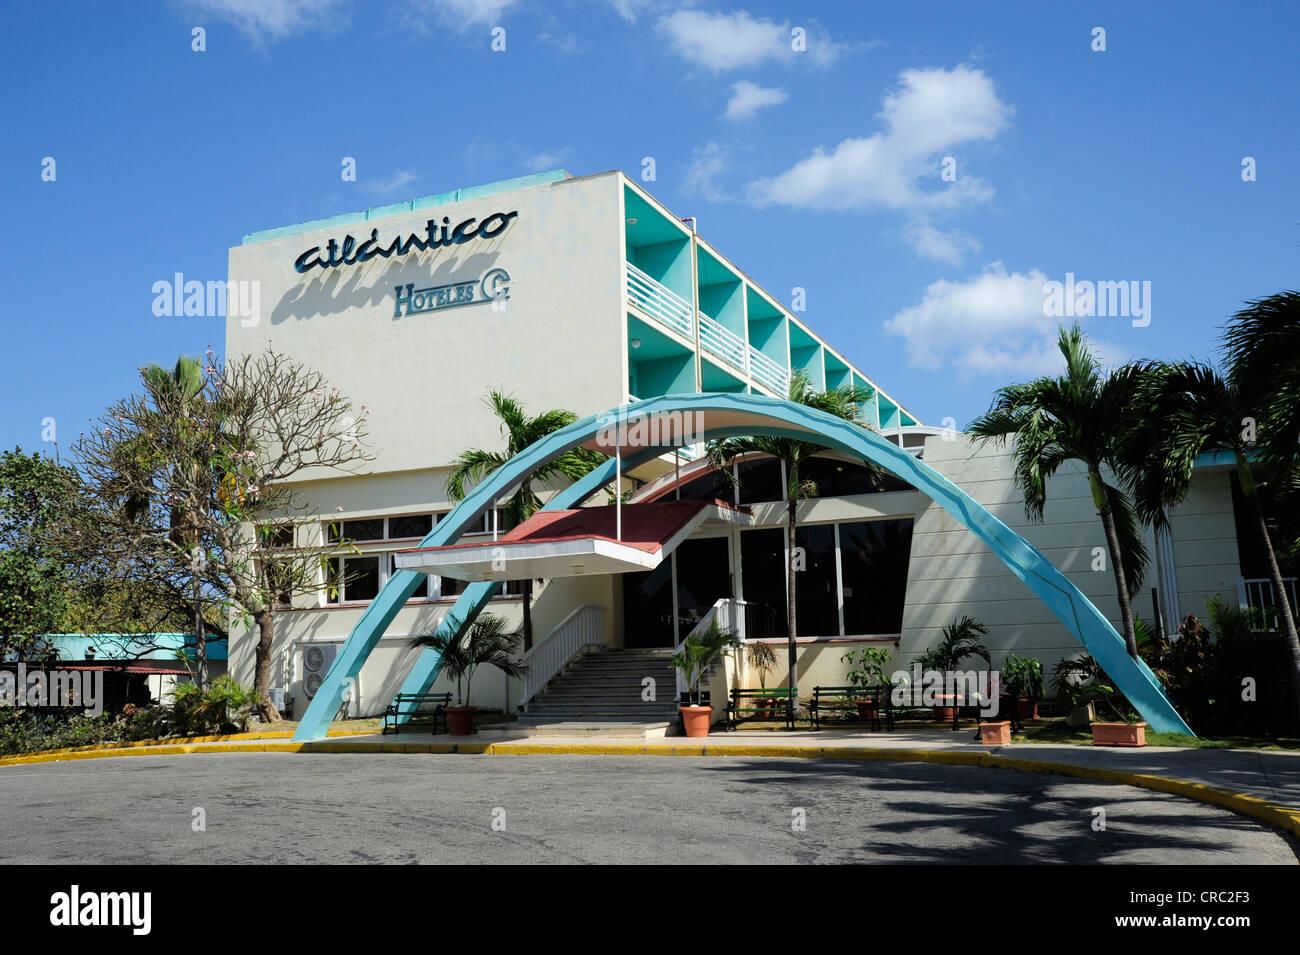 Hotel Atlantico am Strand, Santa Maria del Mar, Playas del Este, Havanna, Habana, Cuba, große Antillen, Golf Stockbild